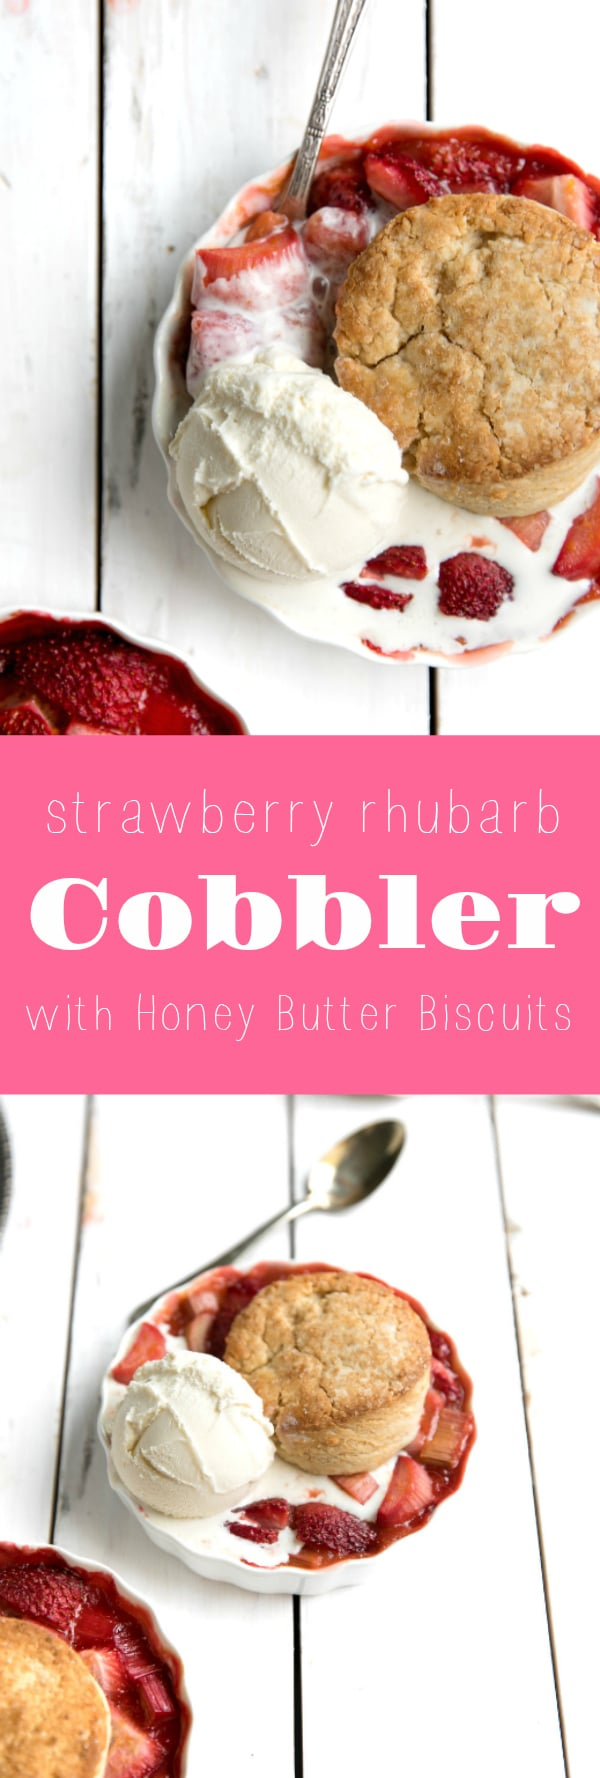 Strawberry Rhubarb Cobbler with Honey Butter Biscuits via @theforkedspoon #dessert #cobbler #rhubarb #pie #strawberry #theforkedspoon